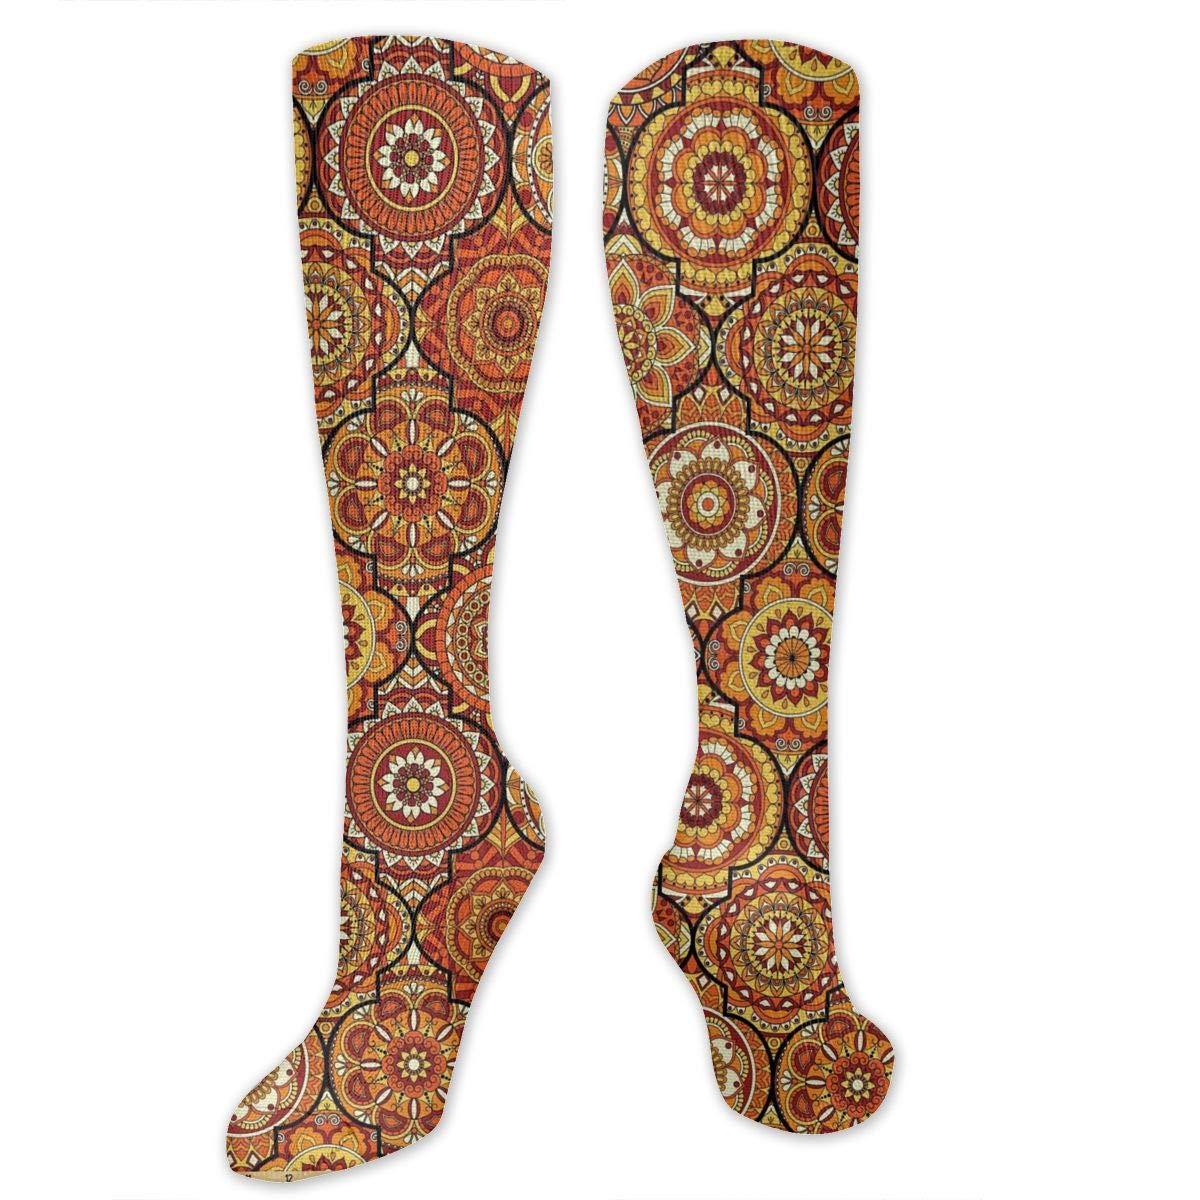 Men Multicolored Pattern Fashionable Fun Crew Cotton Socks Chanwazibibiliu Vintage Hand Drawn Style Mens Colorful Dress Socks Funky